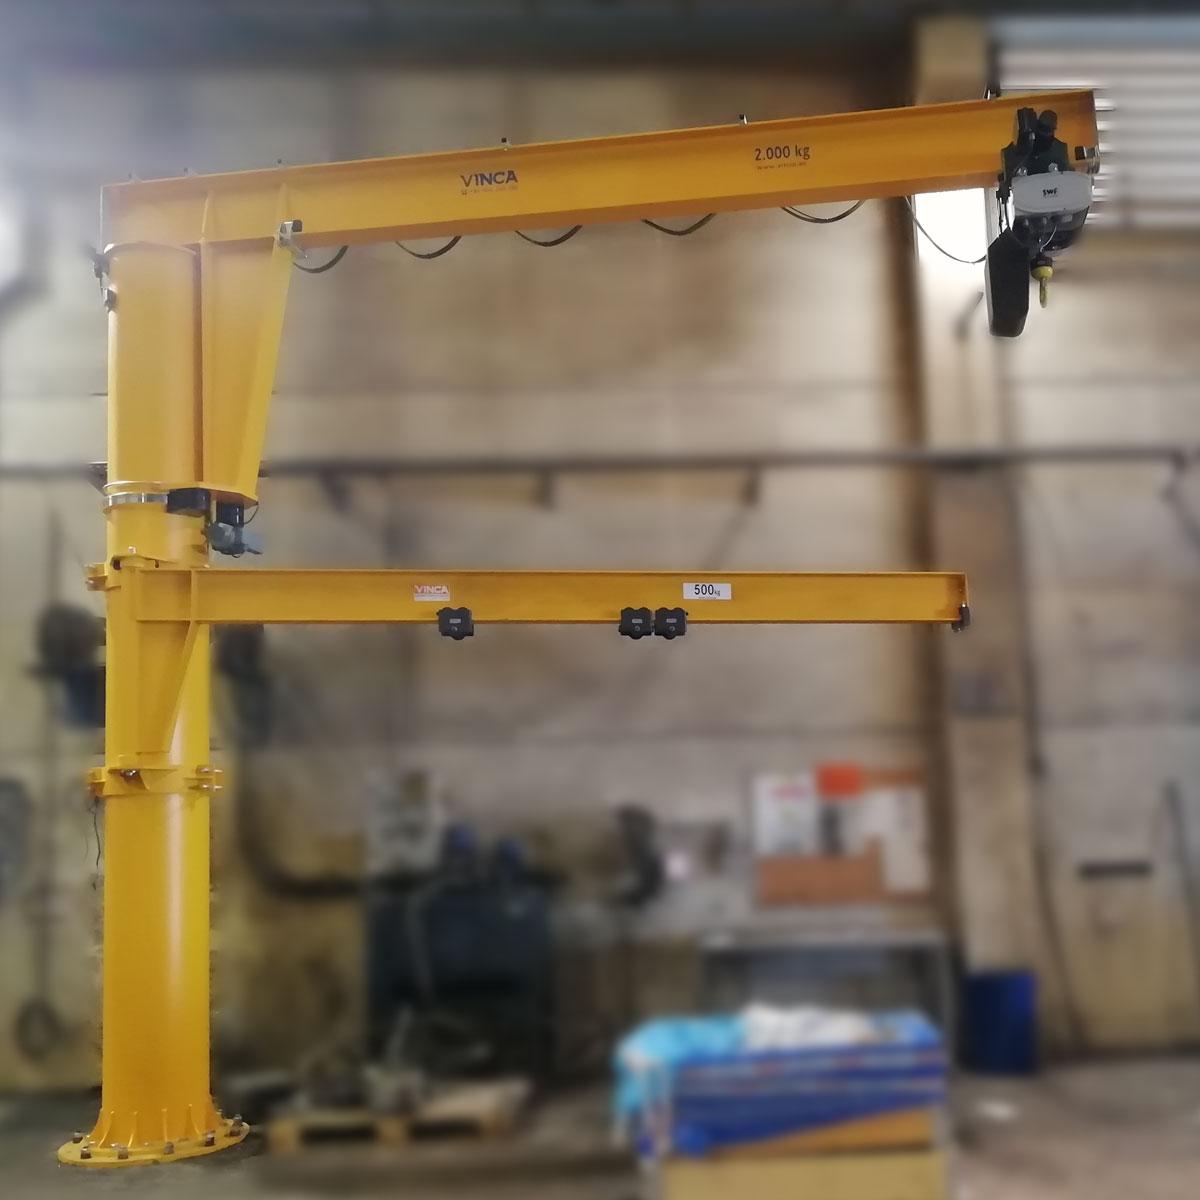 proyecto-metalogenia-pluma-motorizada-brazo-extra-20200609_164733-1.jpg